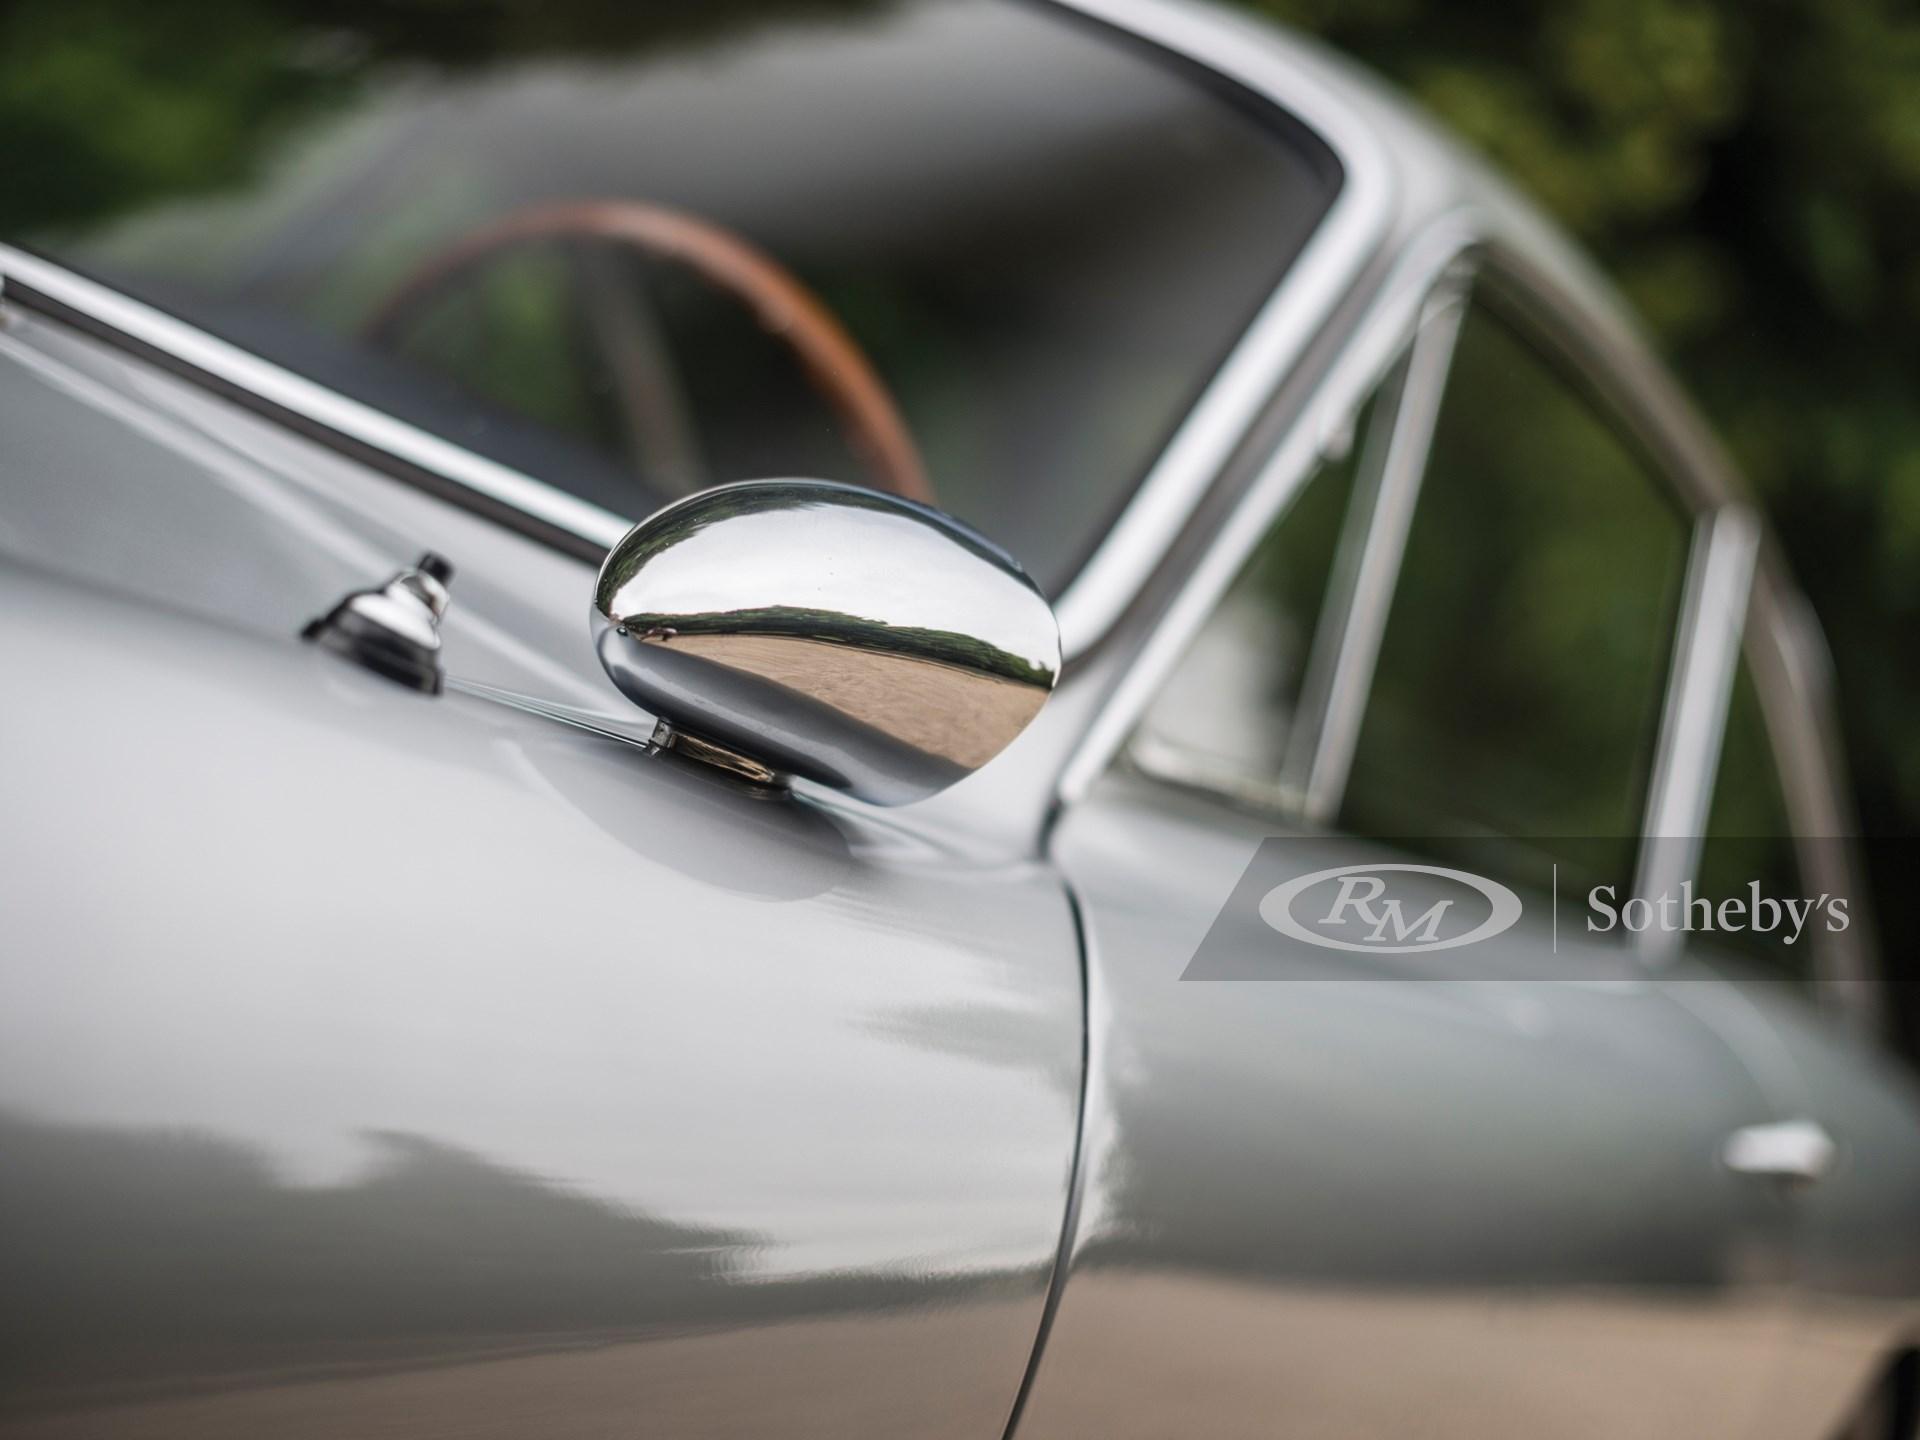 1964 Ferrari 250 GT/L Berlinetta 'Lusso' by Scaglietti -